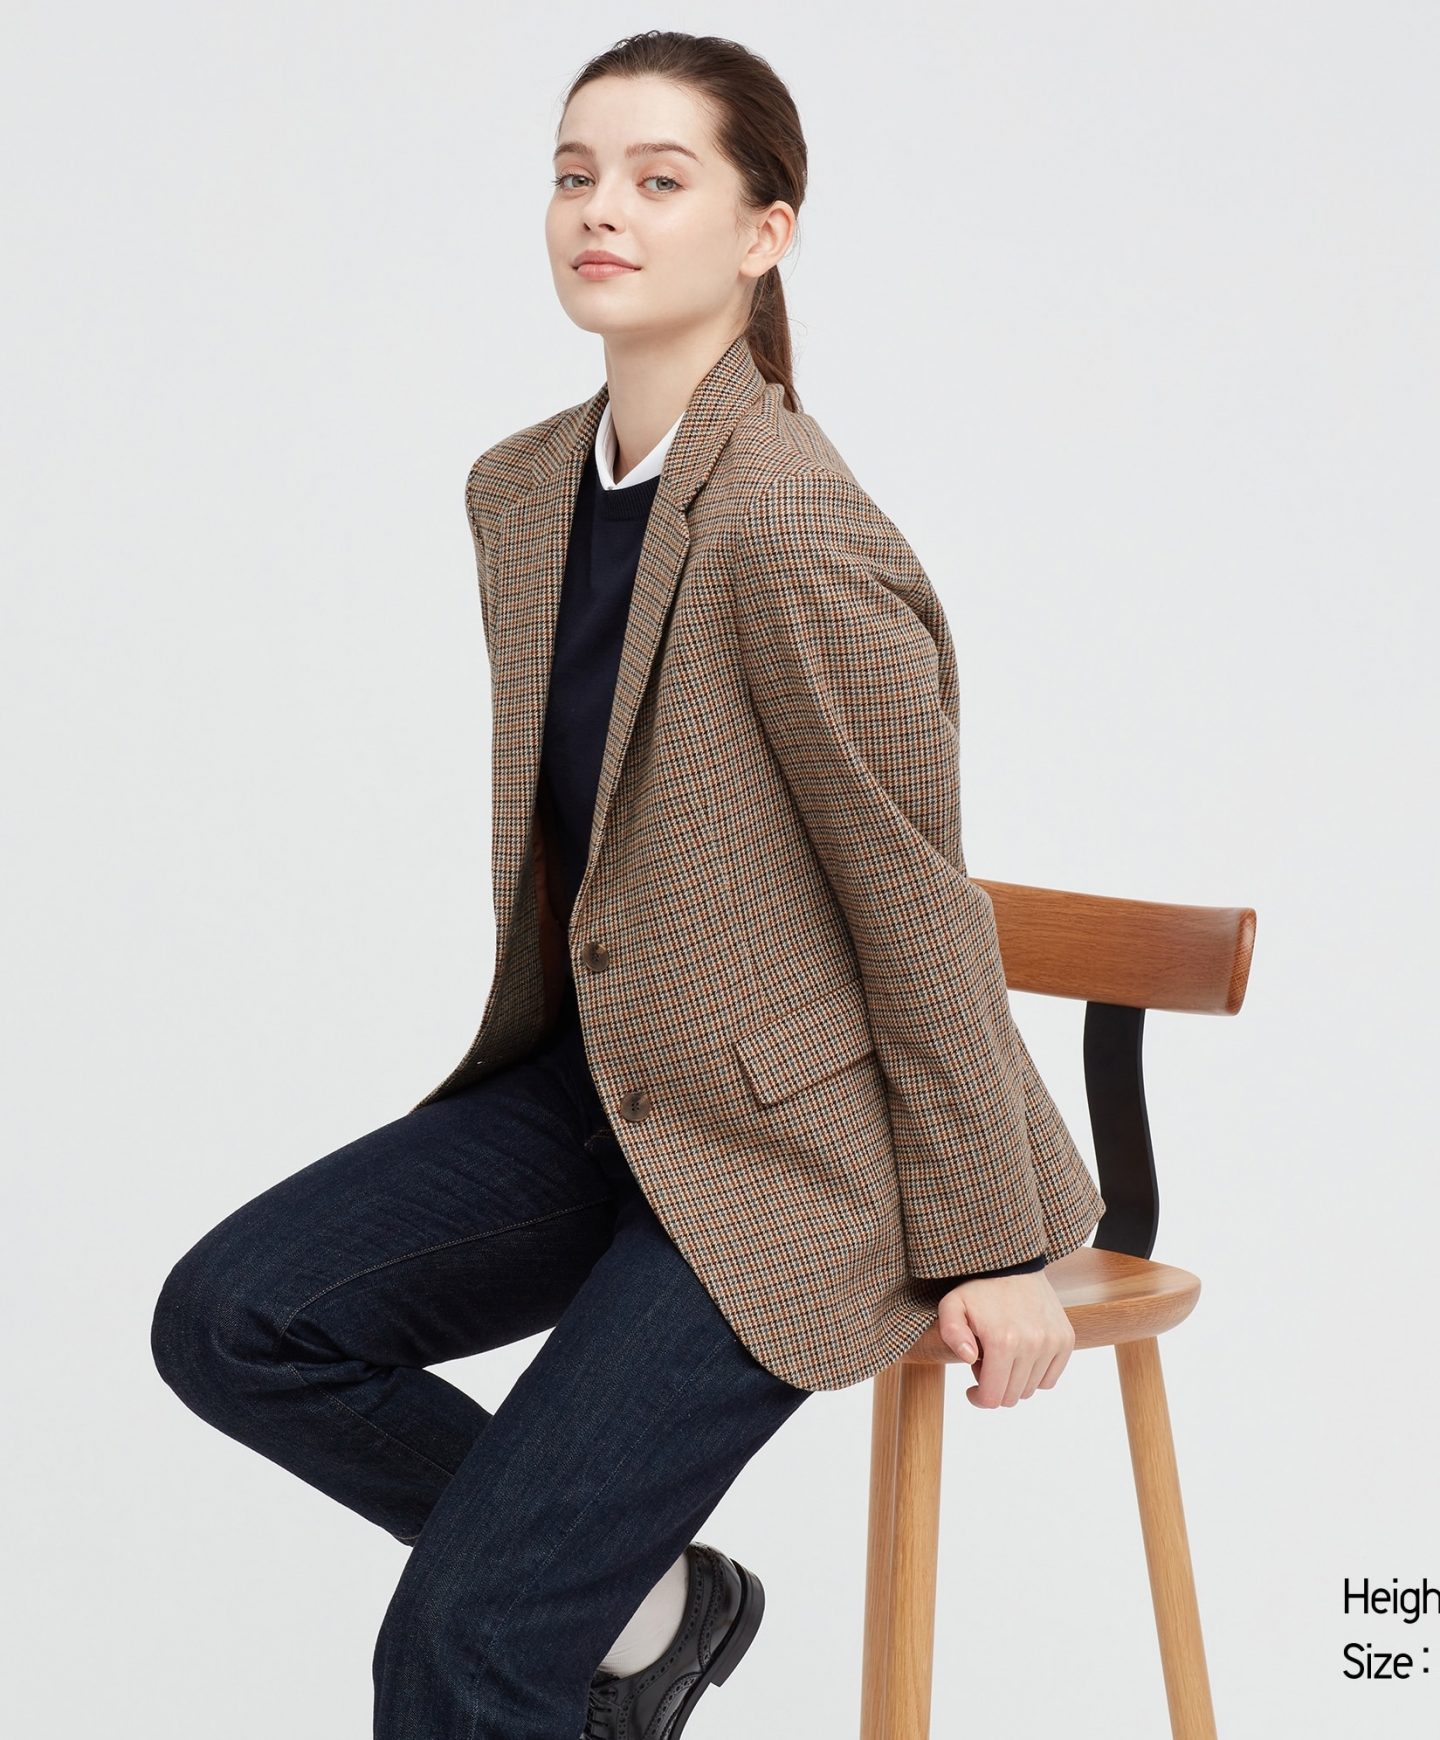 Plaid tailored blazer for dark academia outfits